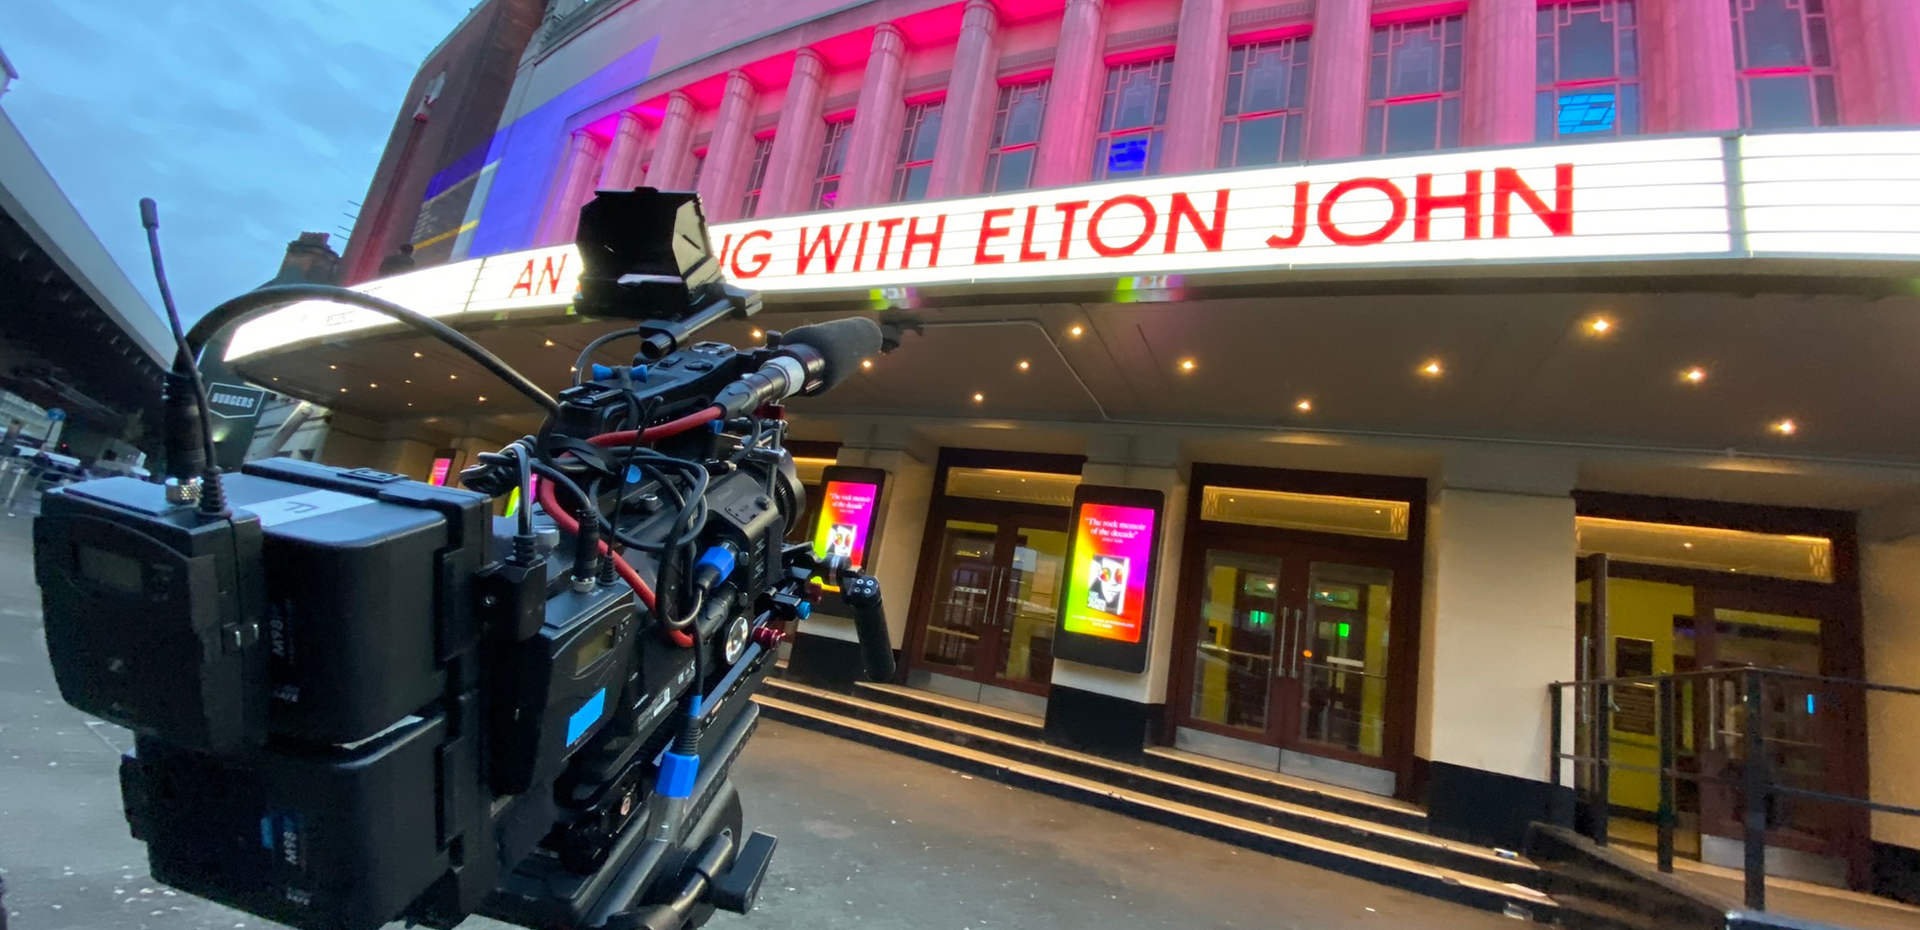 Elton John Event London.JPG